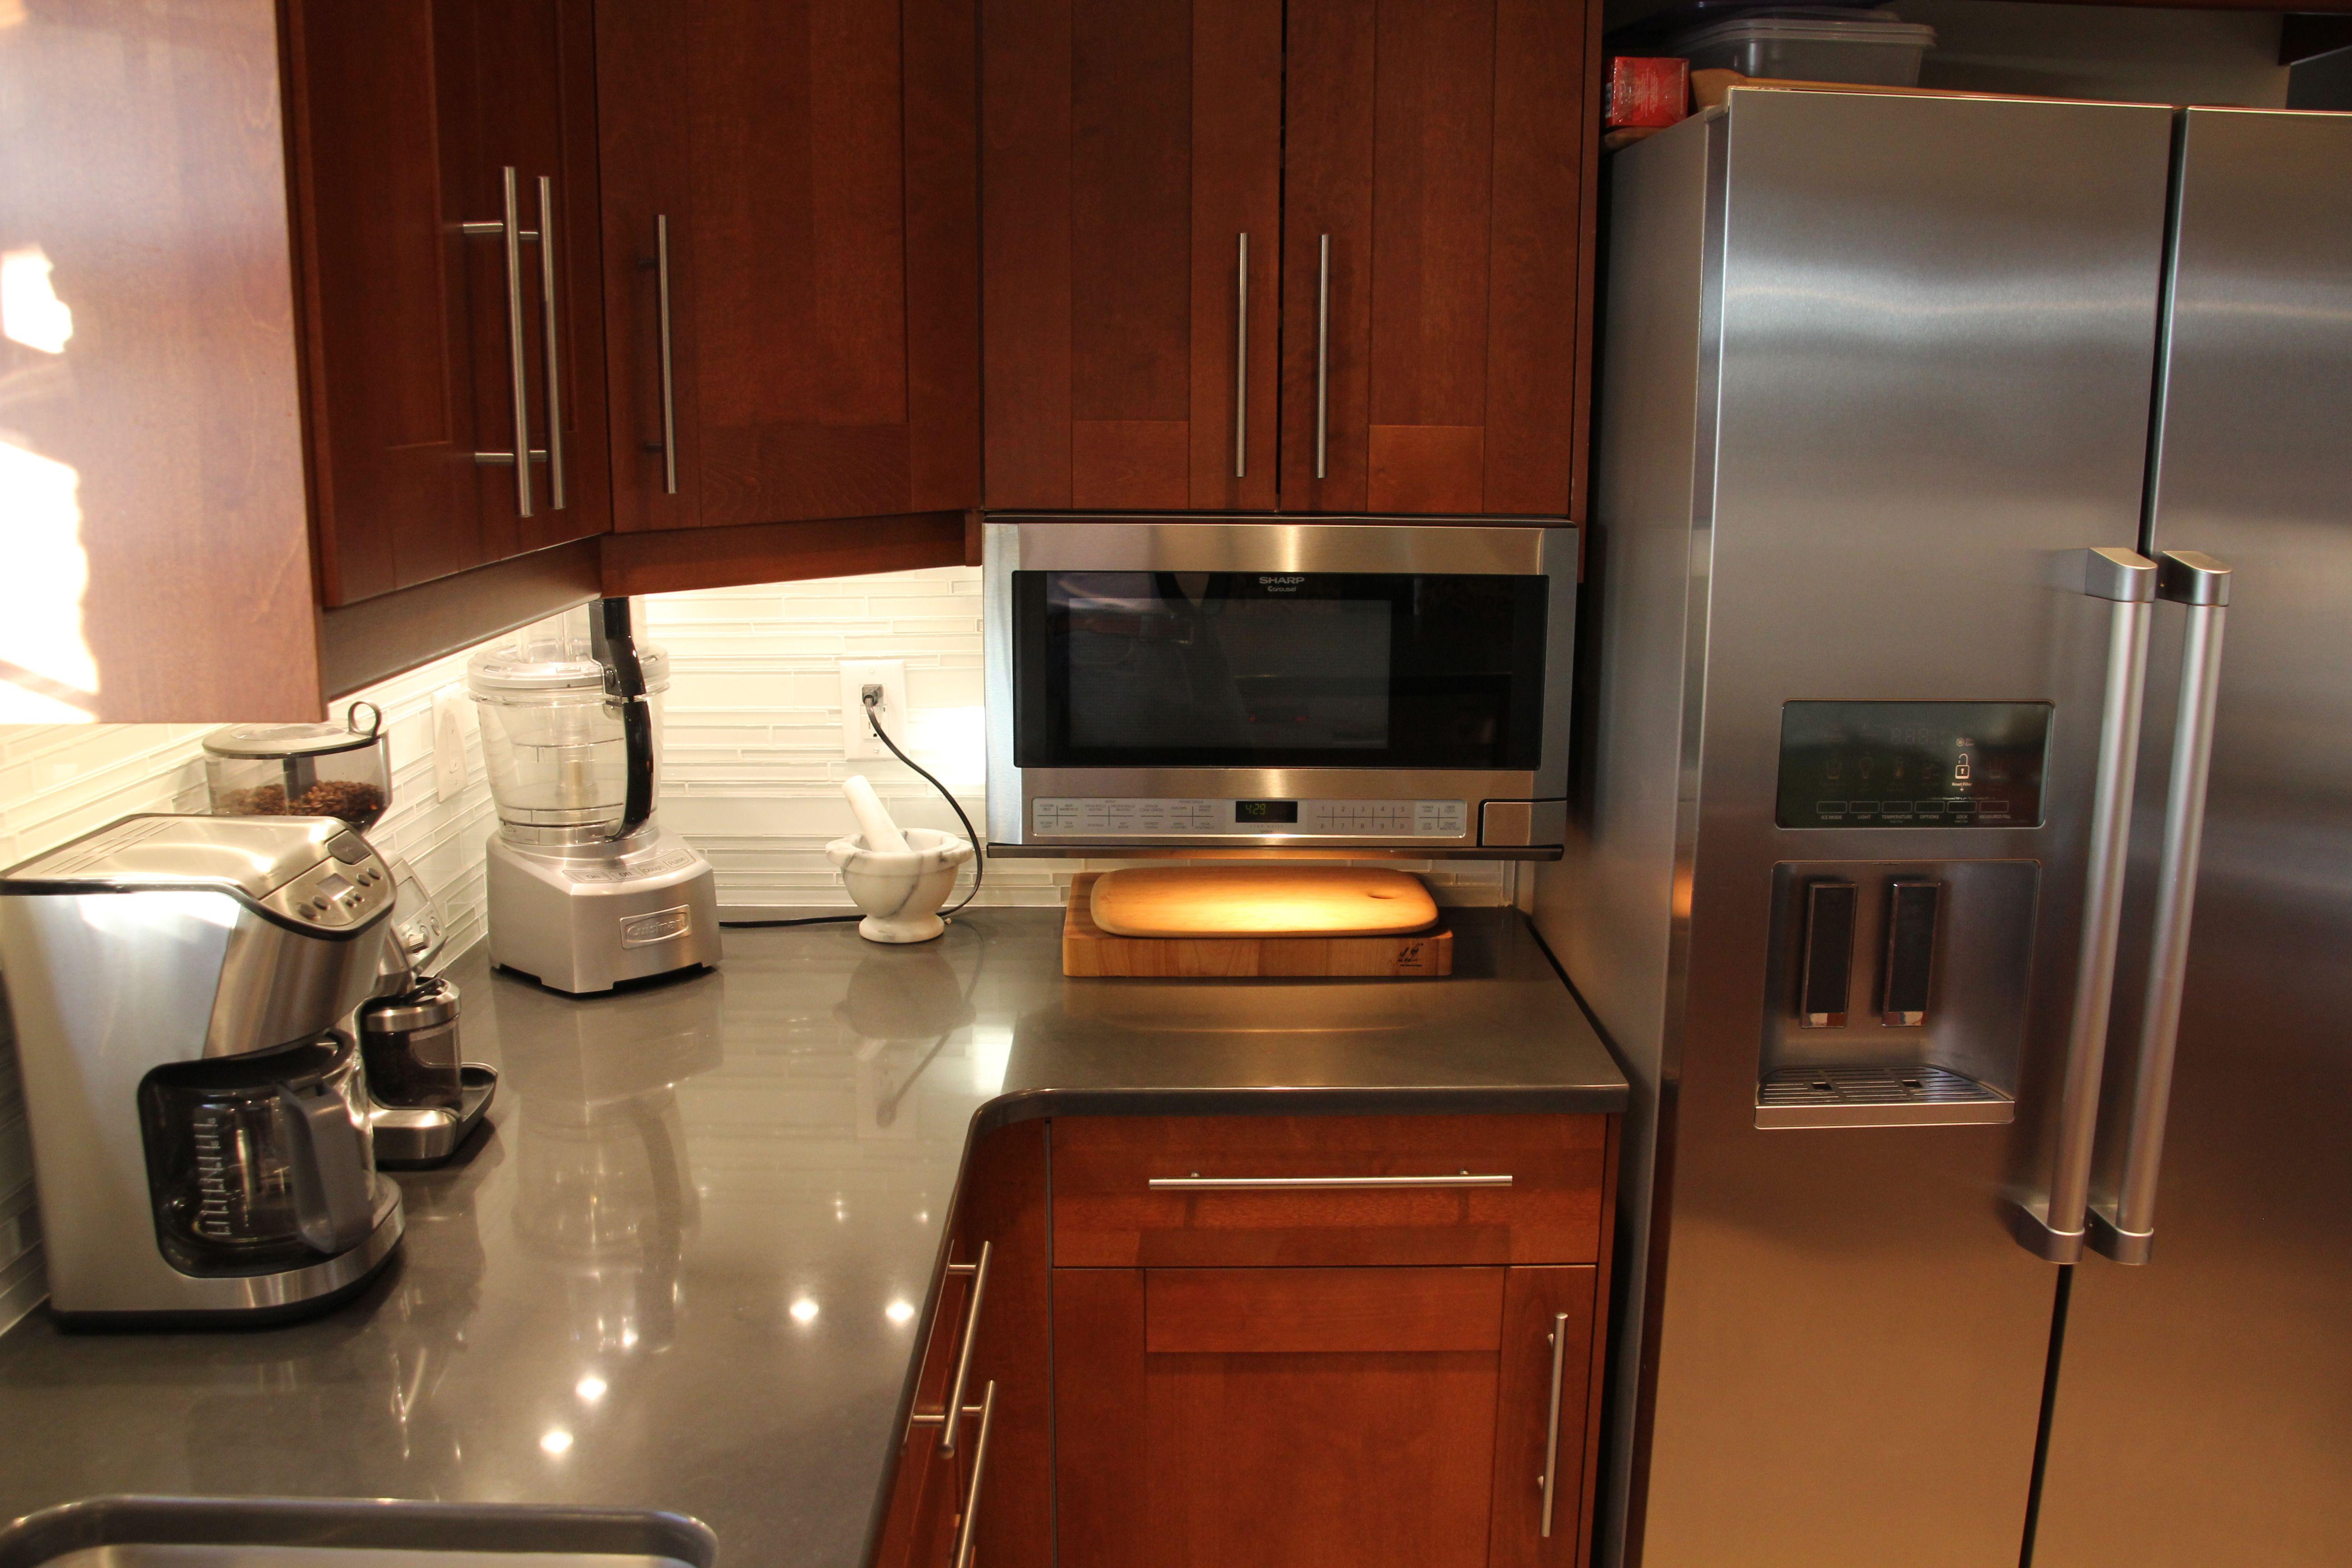 IKEA Kitchens - Adel Medium-Brown  |Adel Kitchens Brown